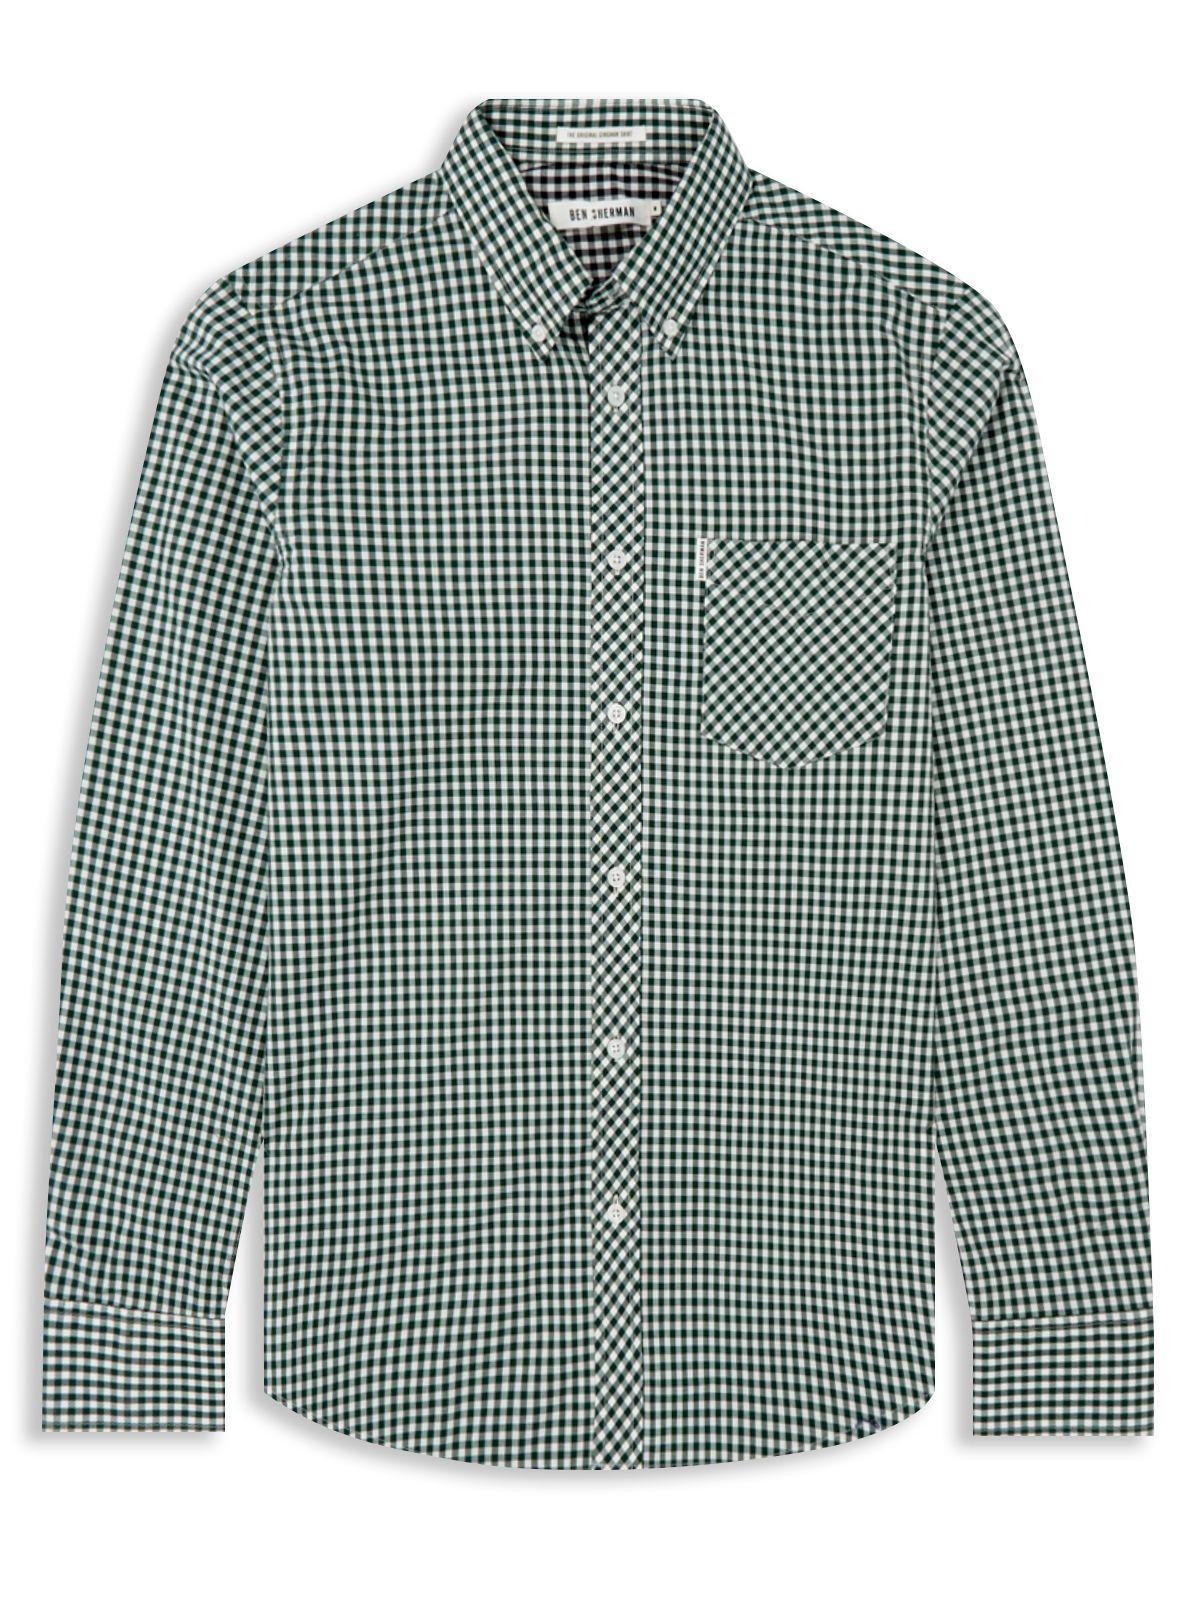 Ben Sherman Classic Gingham Check Long Sleeve Shirt In